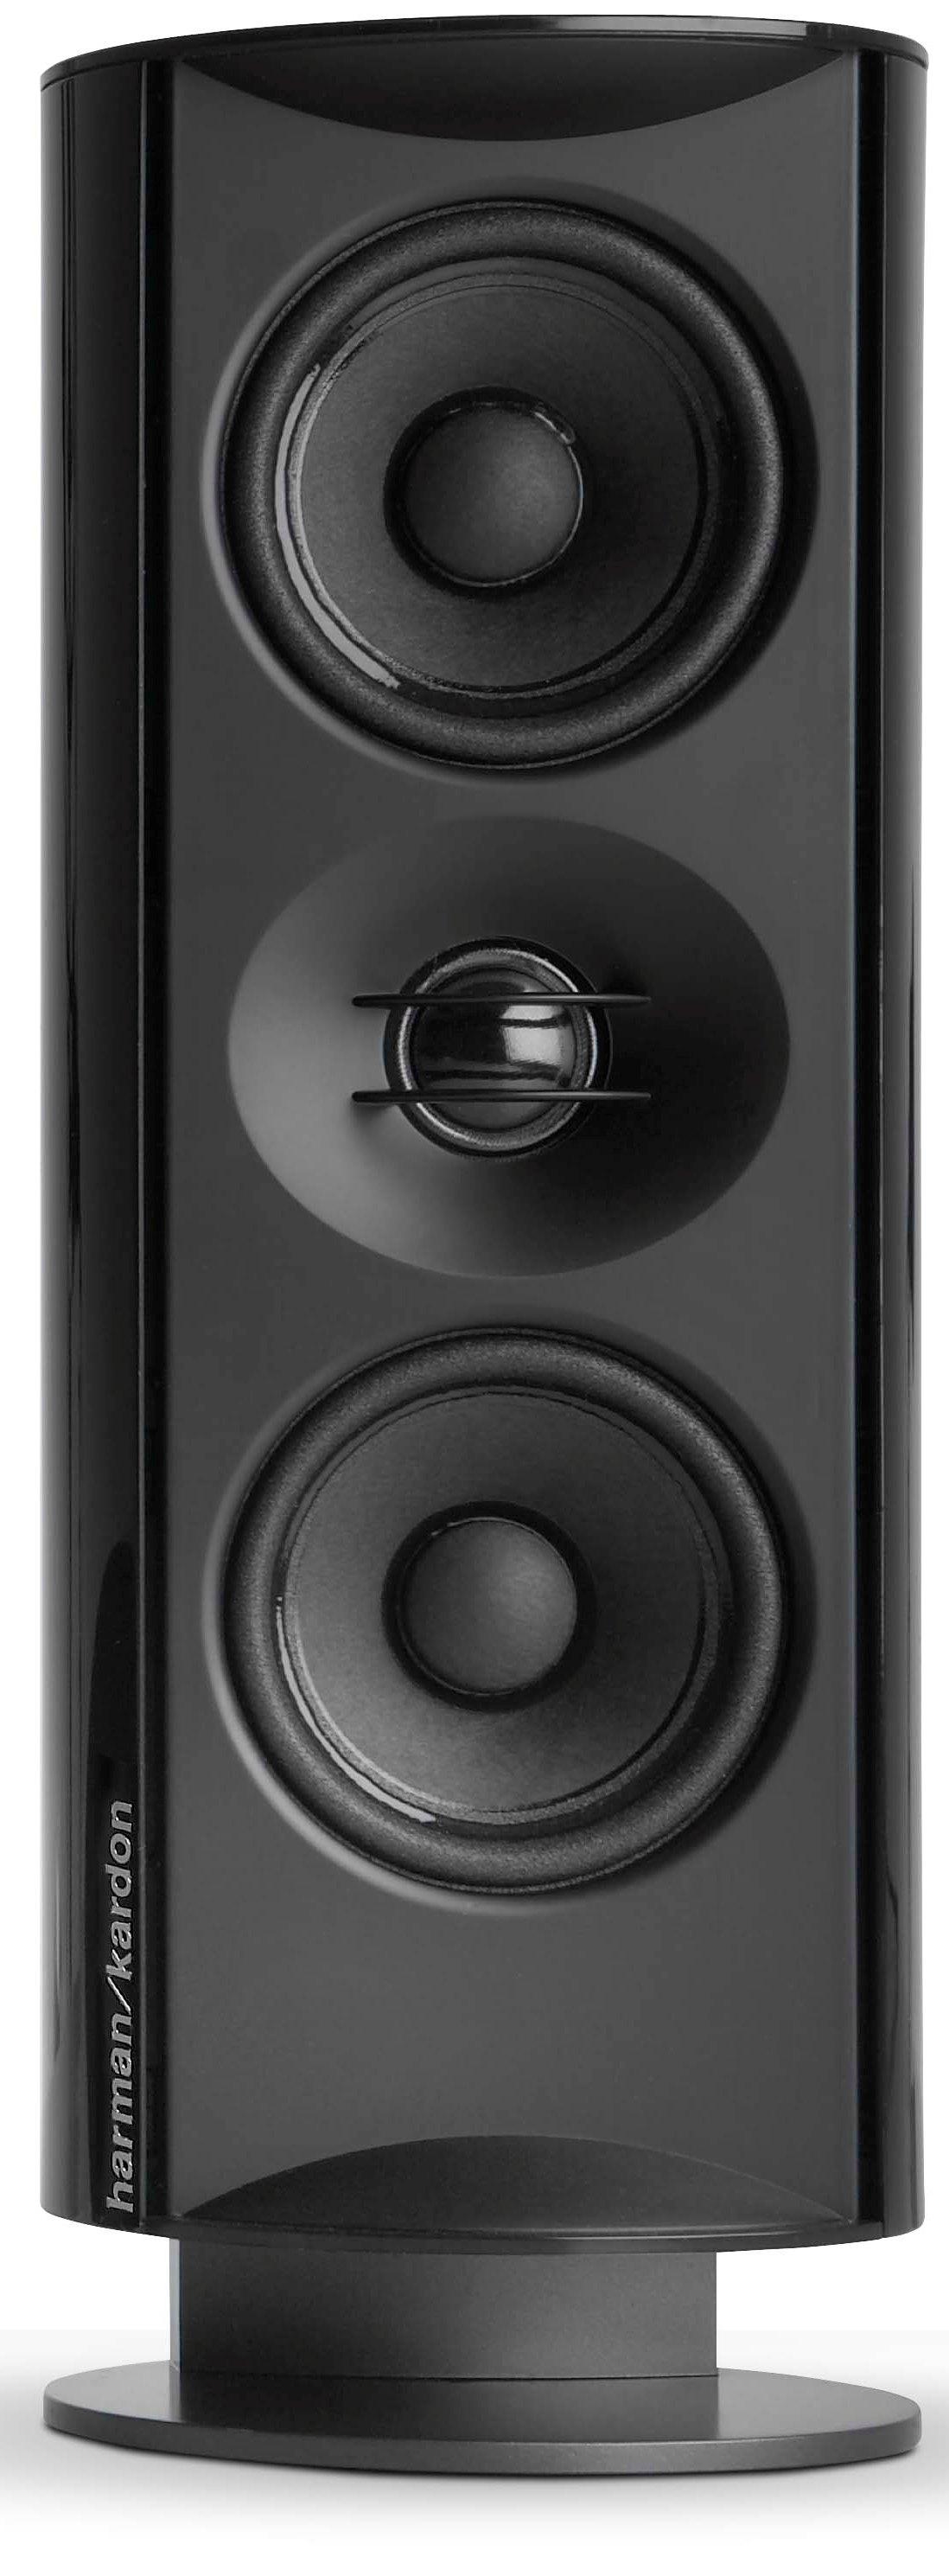 Harman Luxury Audio News: Amazon.com: Harman Kardon HKTS 30BQ 5.1 Home Theater